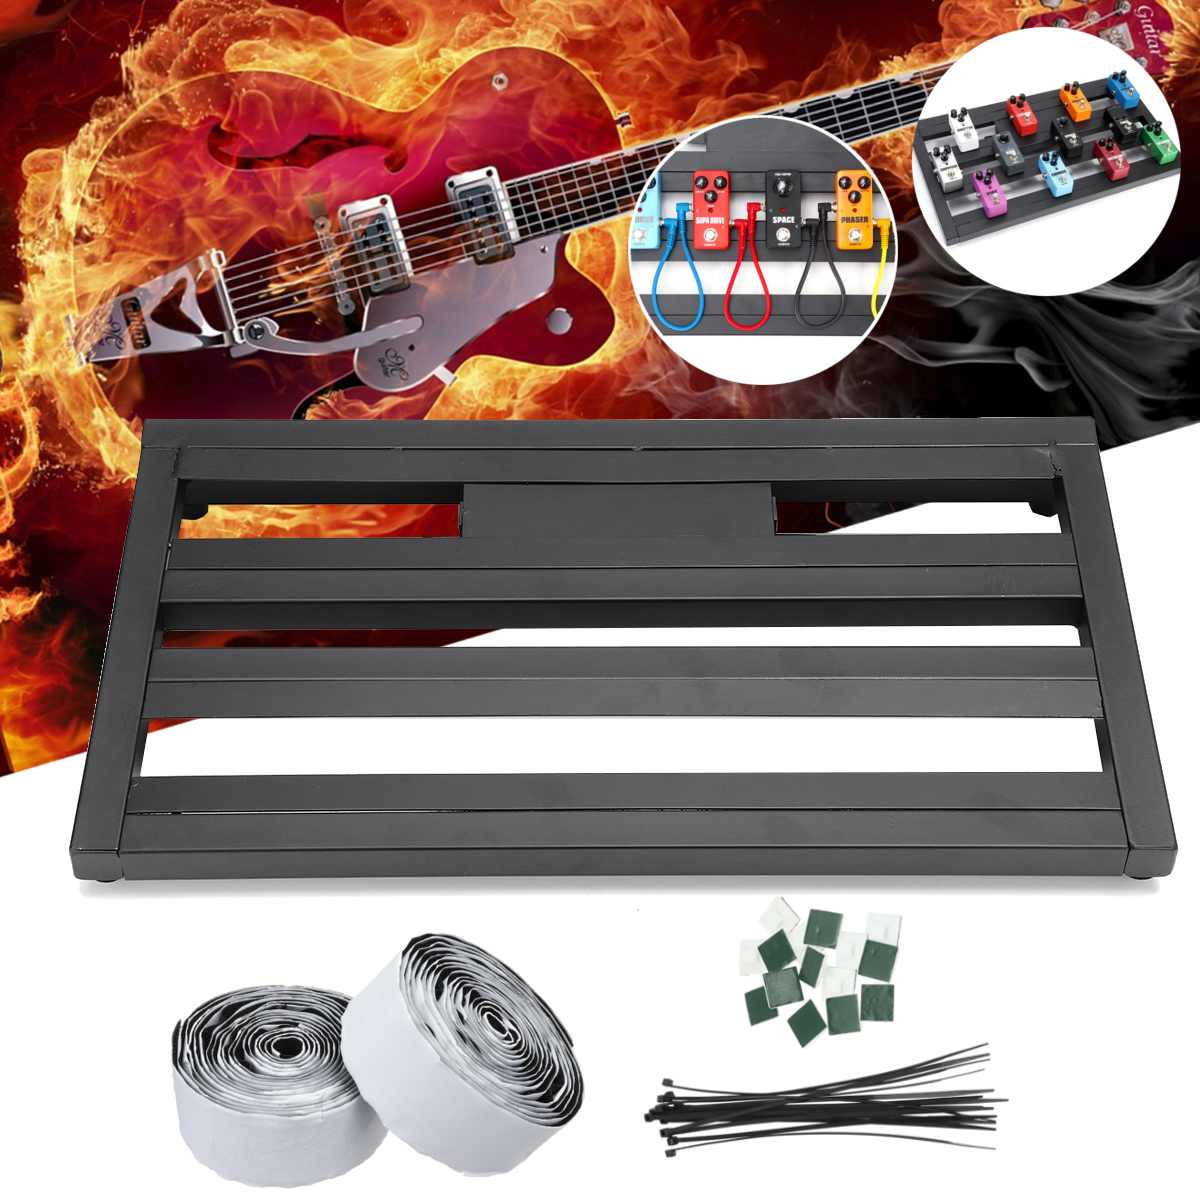 Guitar Effects Pedal Board Portable Aluminium Alloy+Ties+Tape+Explant SetGuitar Effects Pedal Board Portable Aluminium Alloy+Ties+Tape+Explant Set